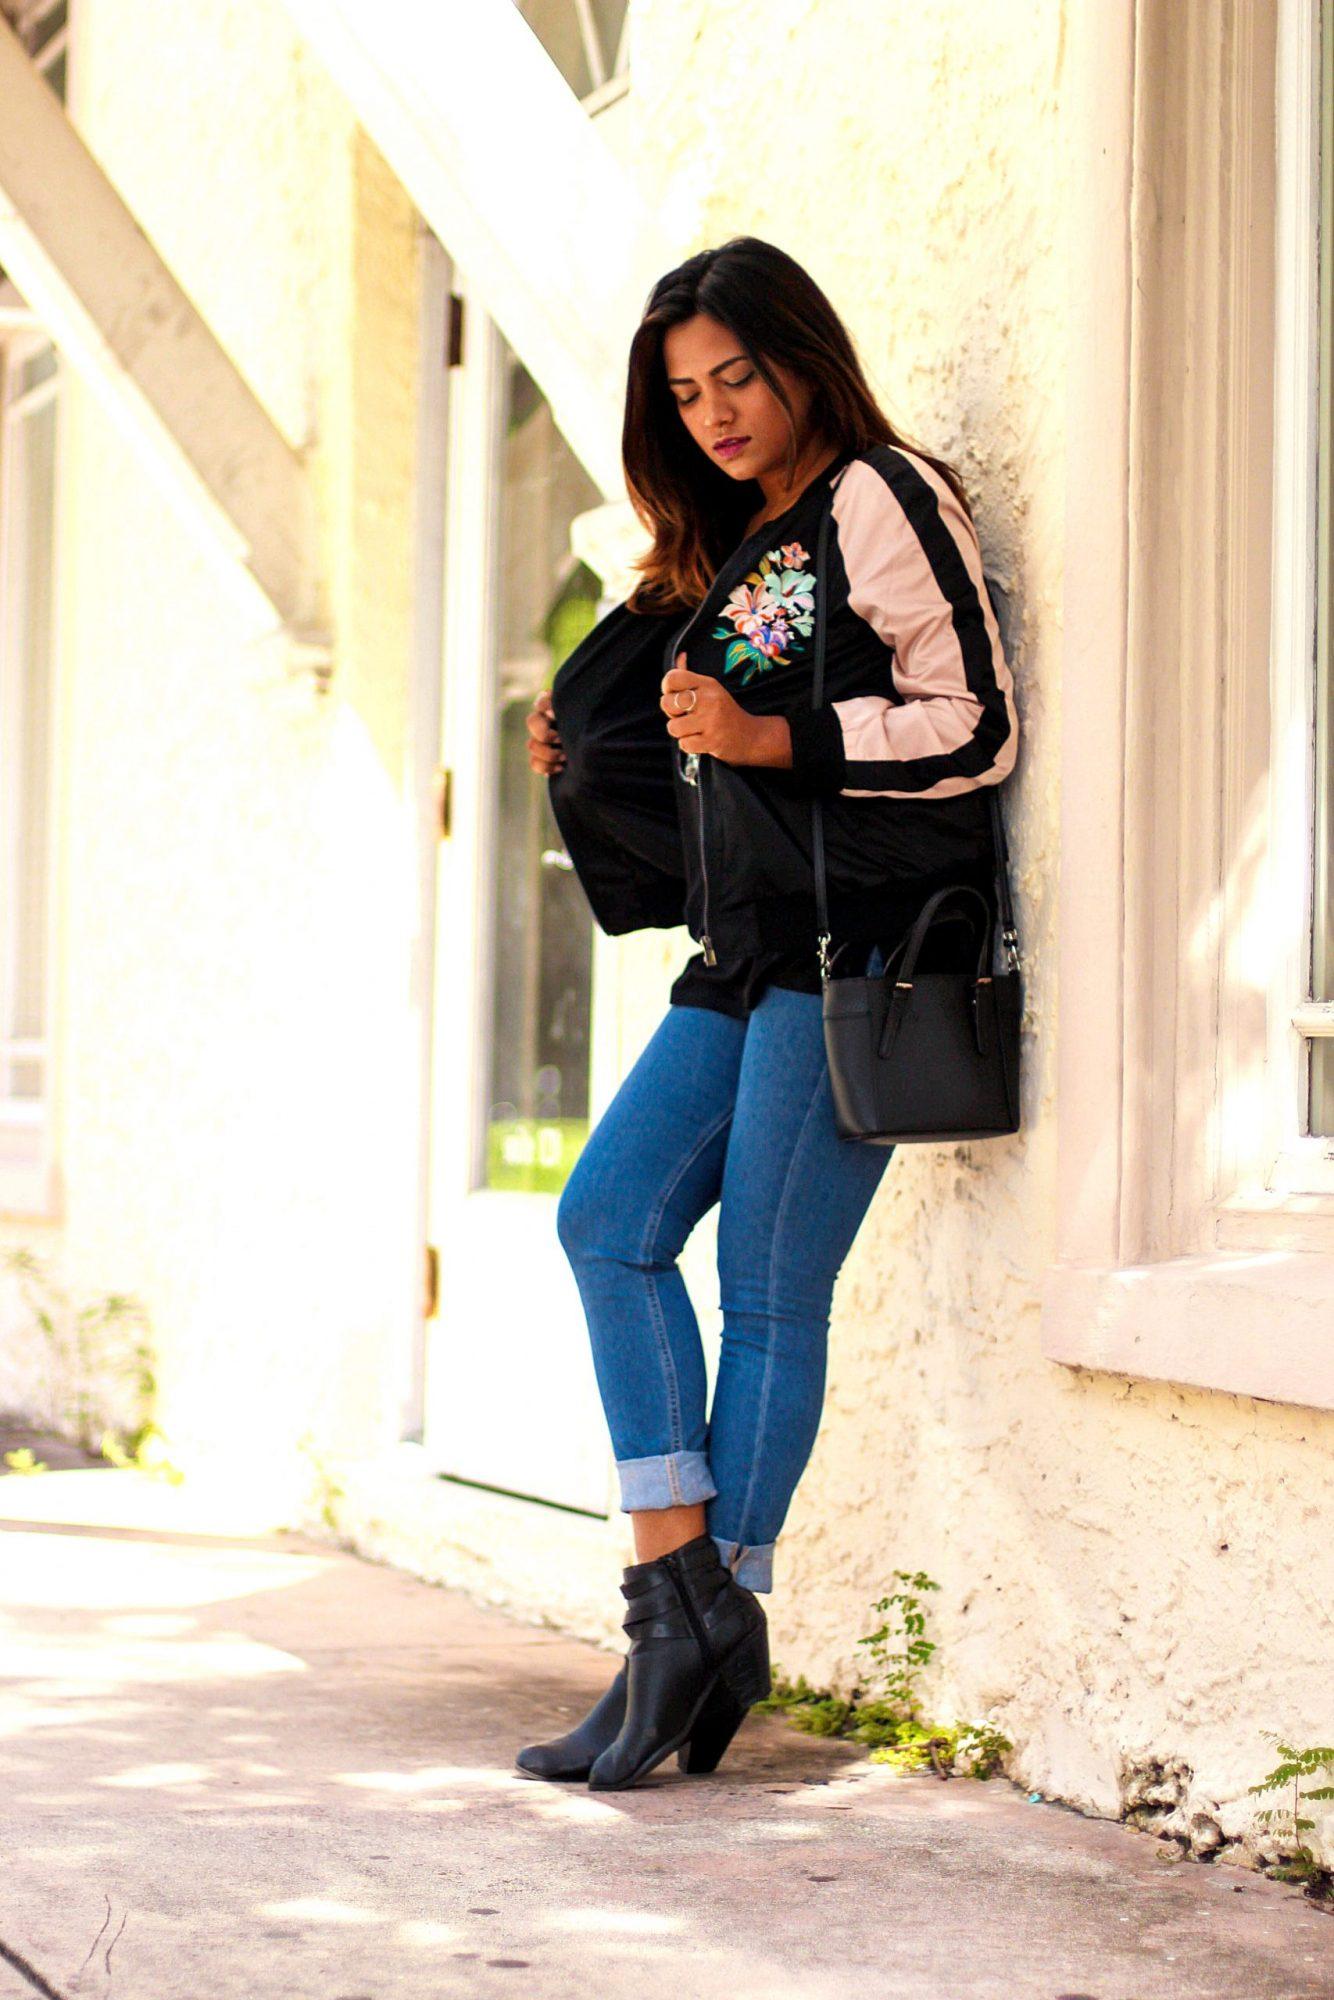 chic-stylista-miami-fashion-blogger-influencer